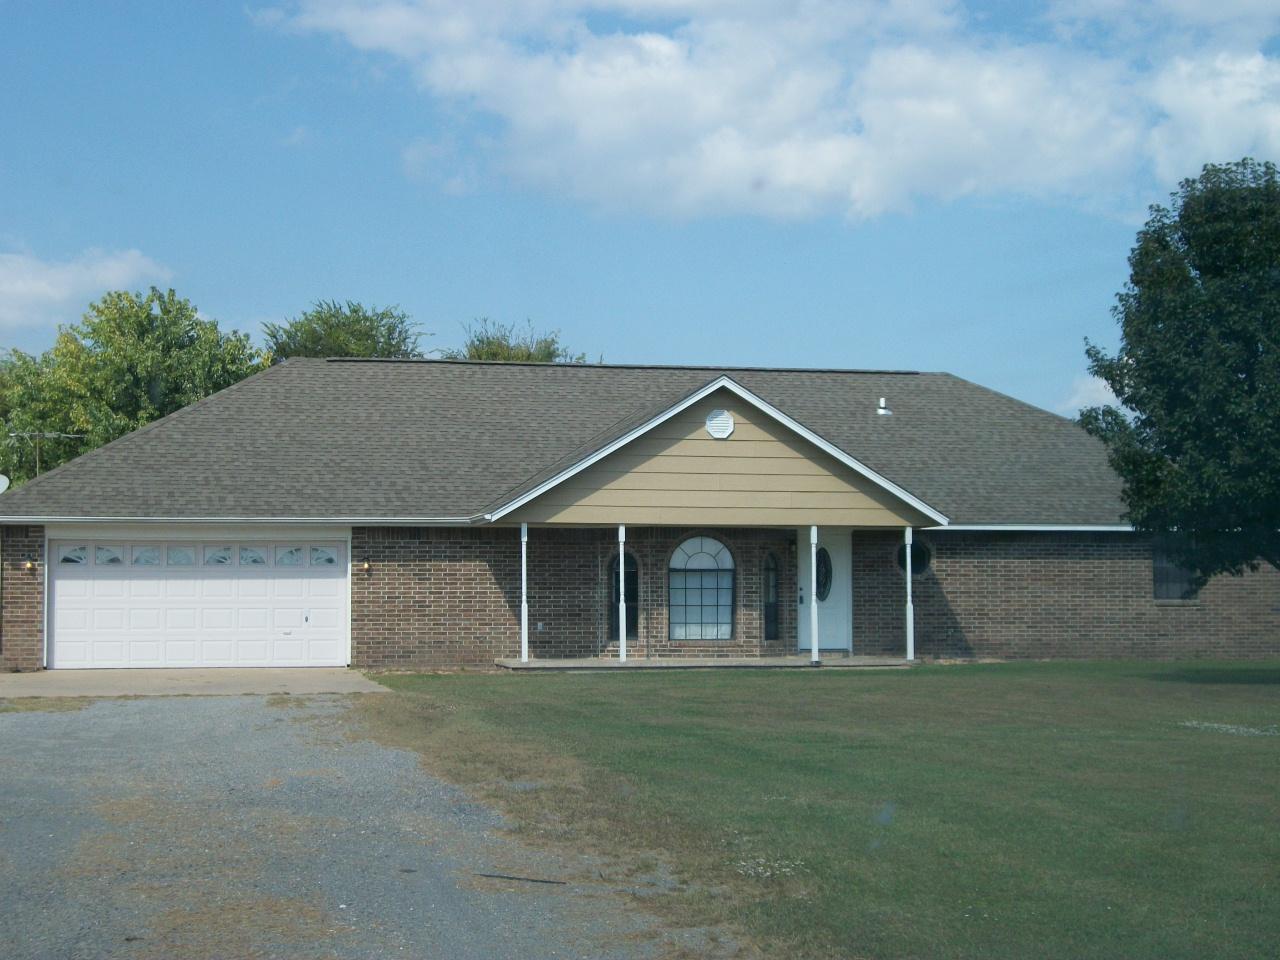 403 Cherry St, Locust Grove, Oklahoma 74352